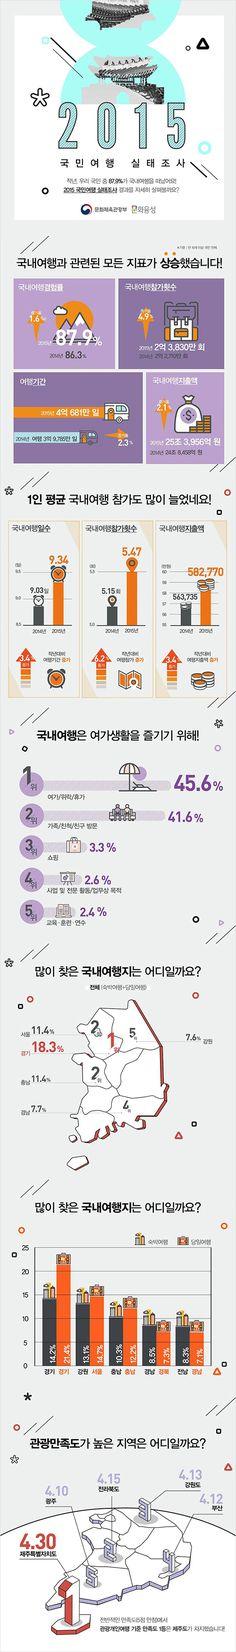 Korean branding and layout Web Design, Chart Design, Page Design, Graphic Design, Editorial Layout, Editorial Design, Web Layout, Layout Design, Korean Design